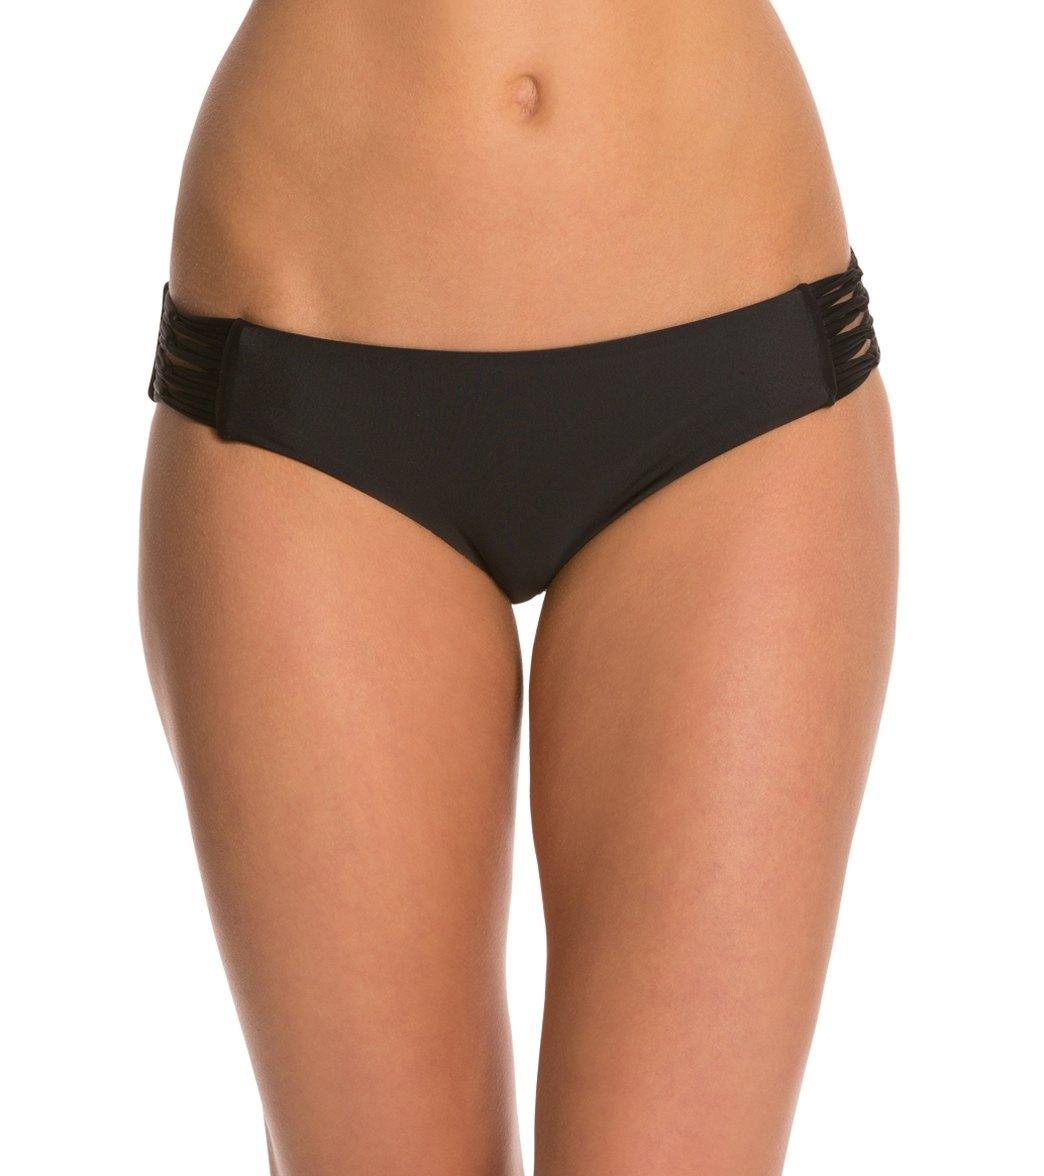 Body Glove Swimwear Ruby Boy Leg Bikini Bottom